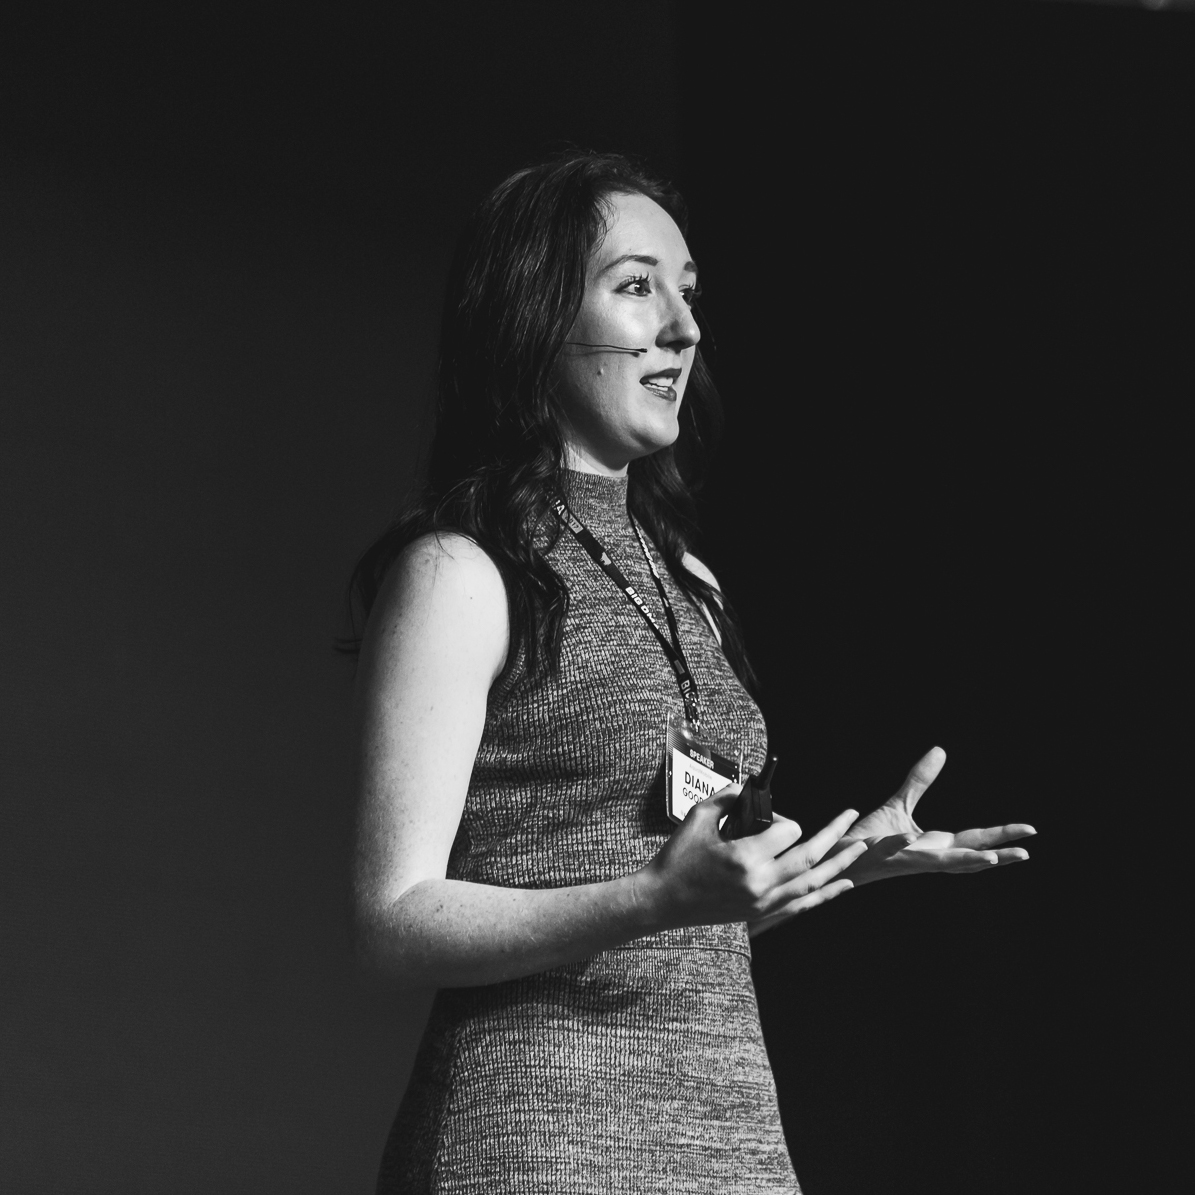 Diana Goodwin, CEO of MarketBox, an online service marketplace platform